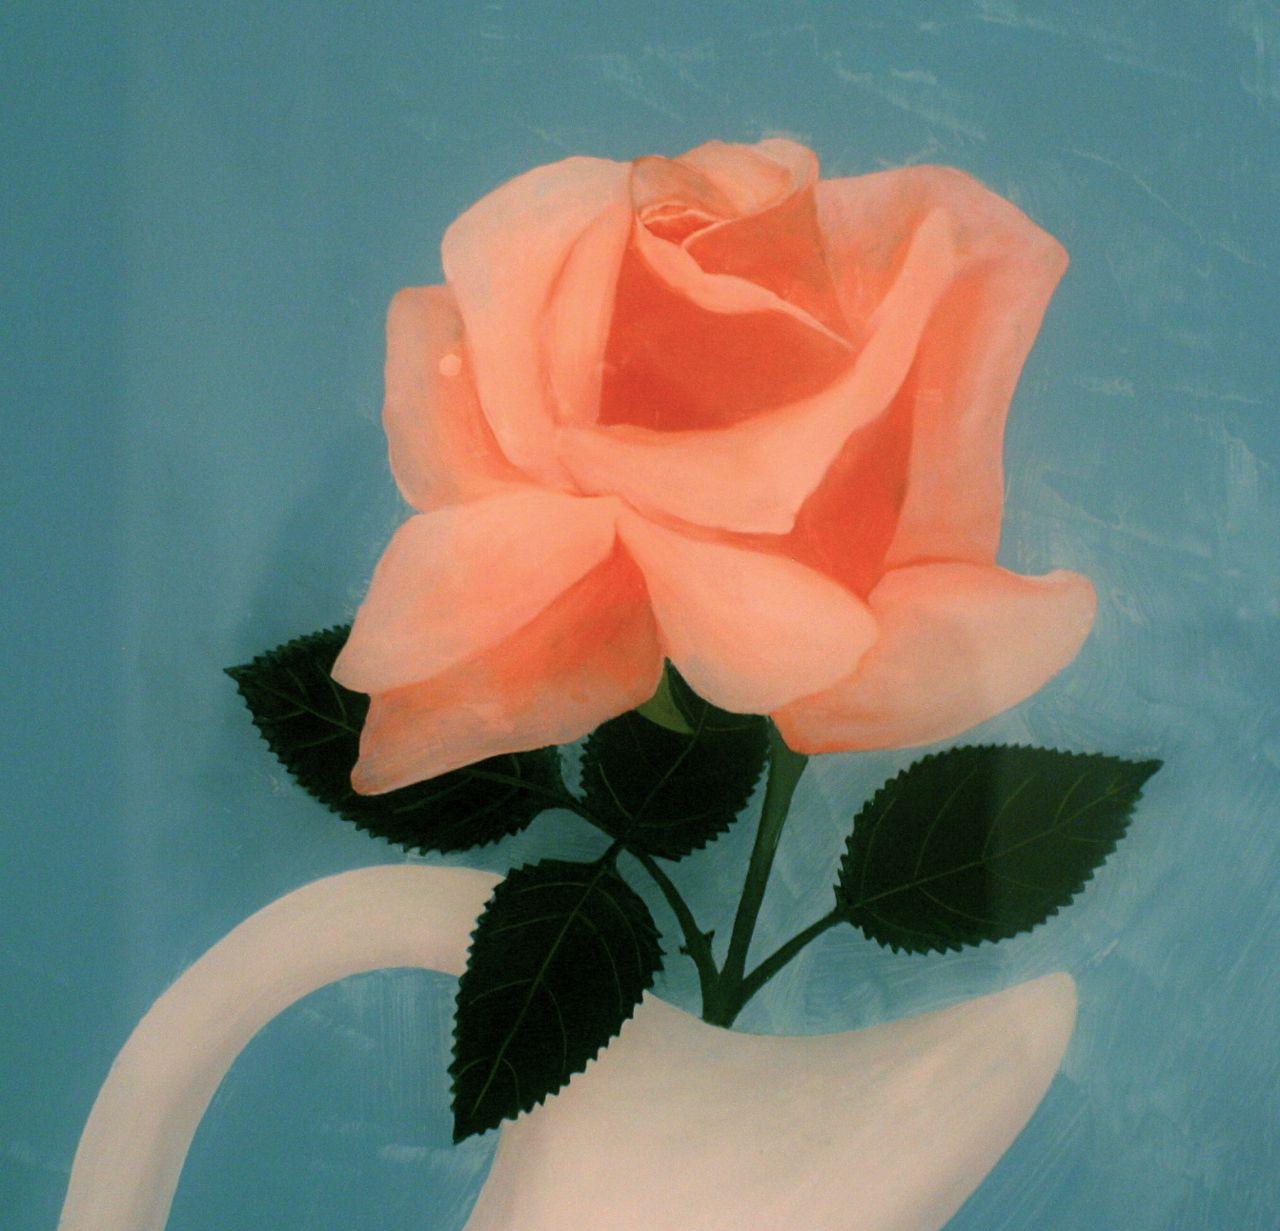 rebecca james_rose